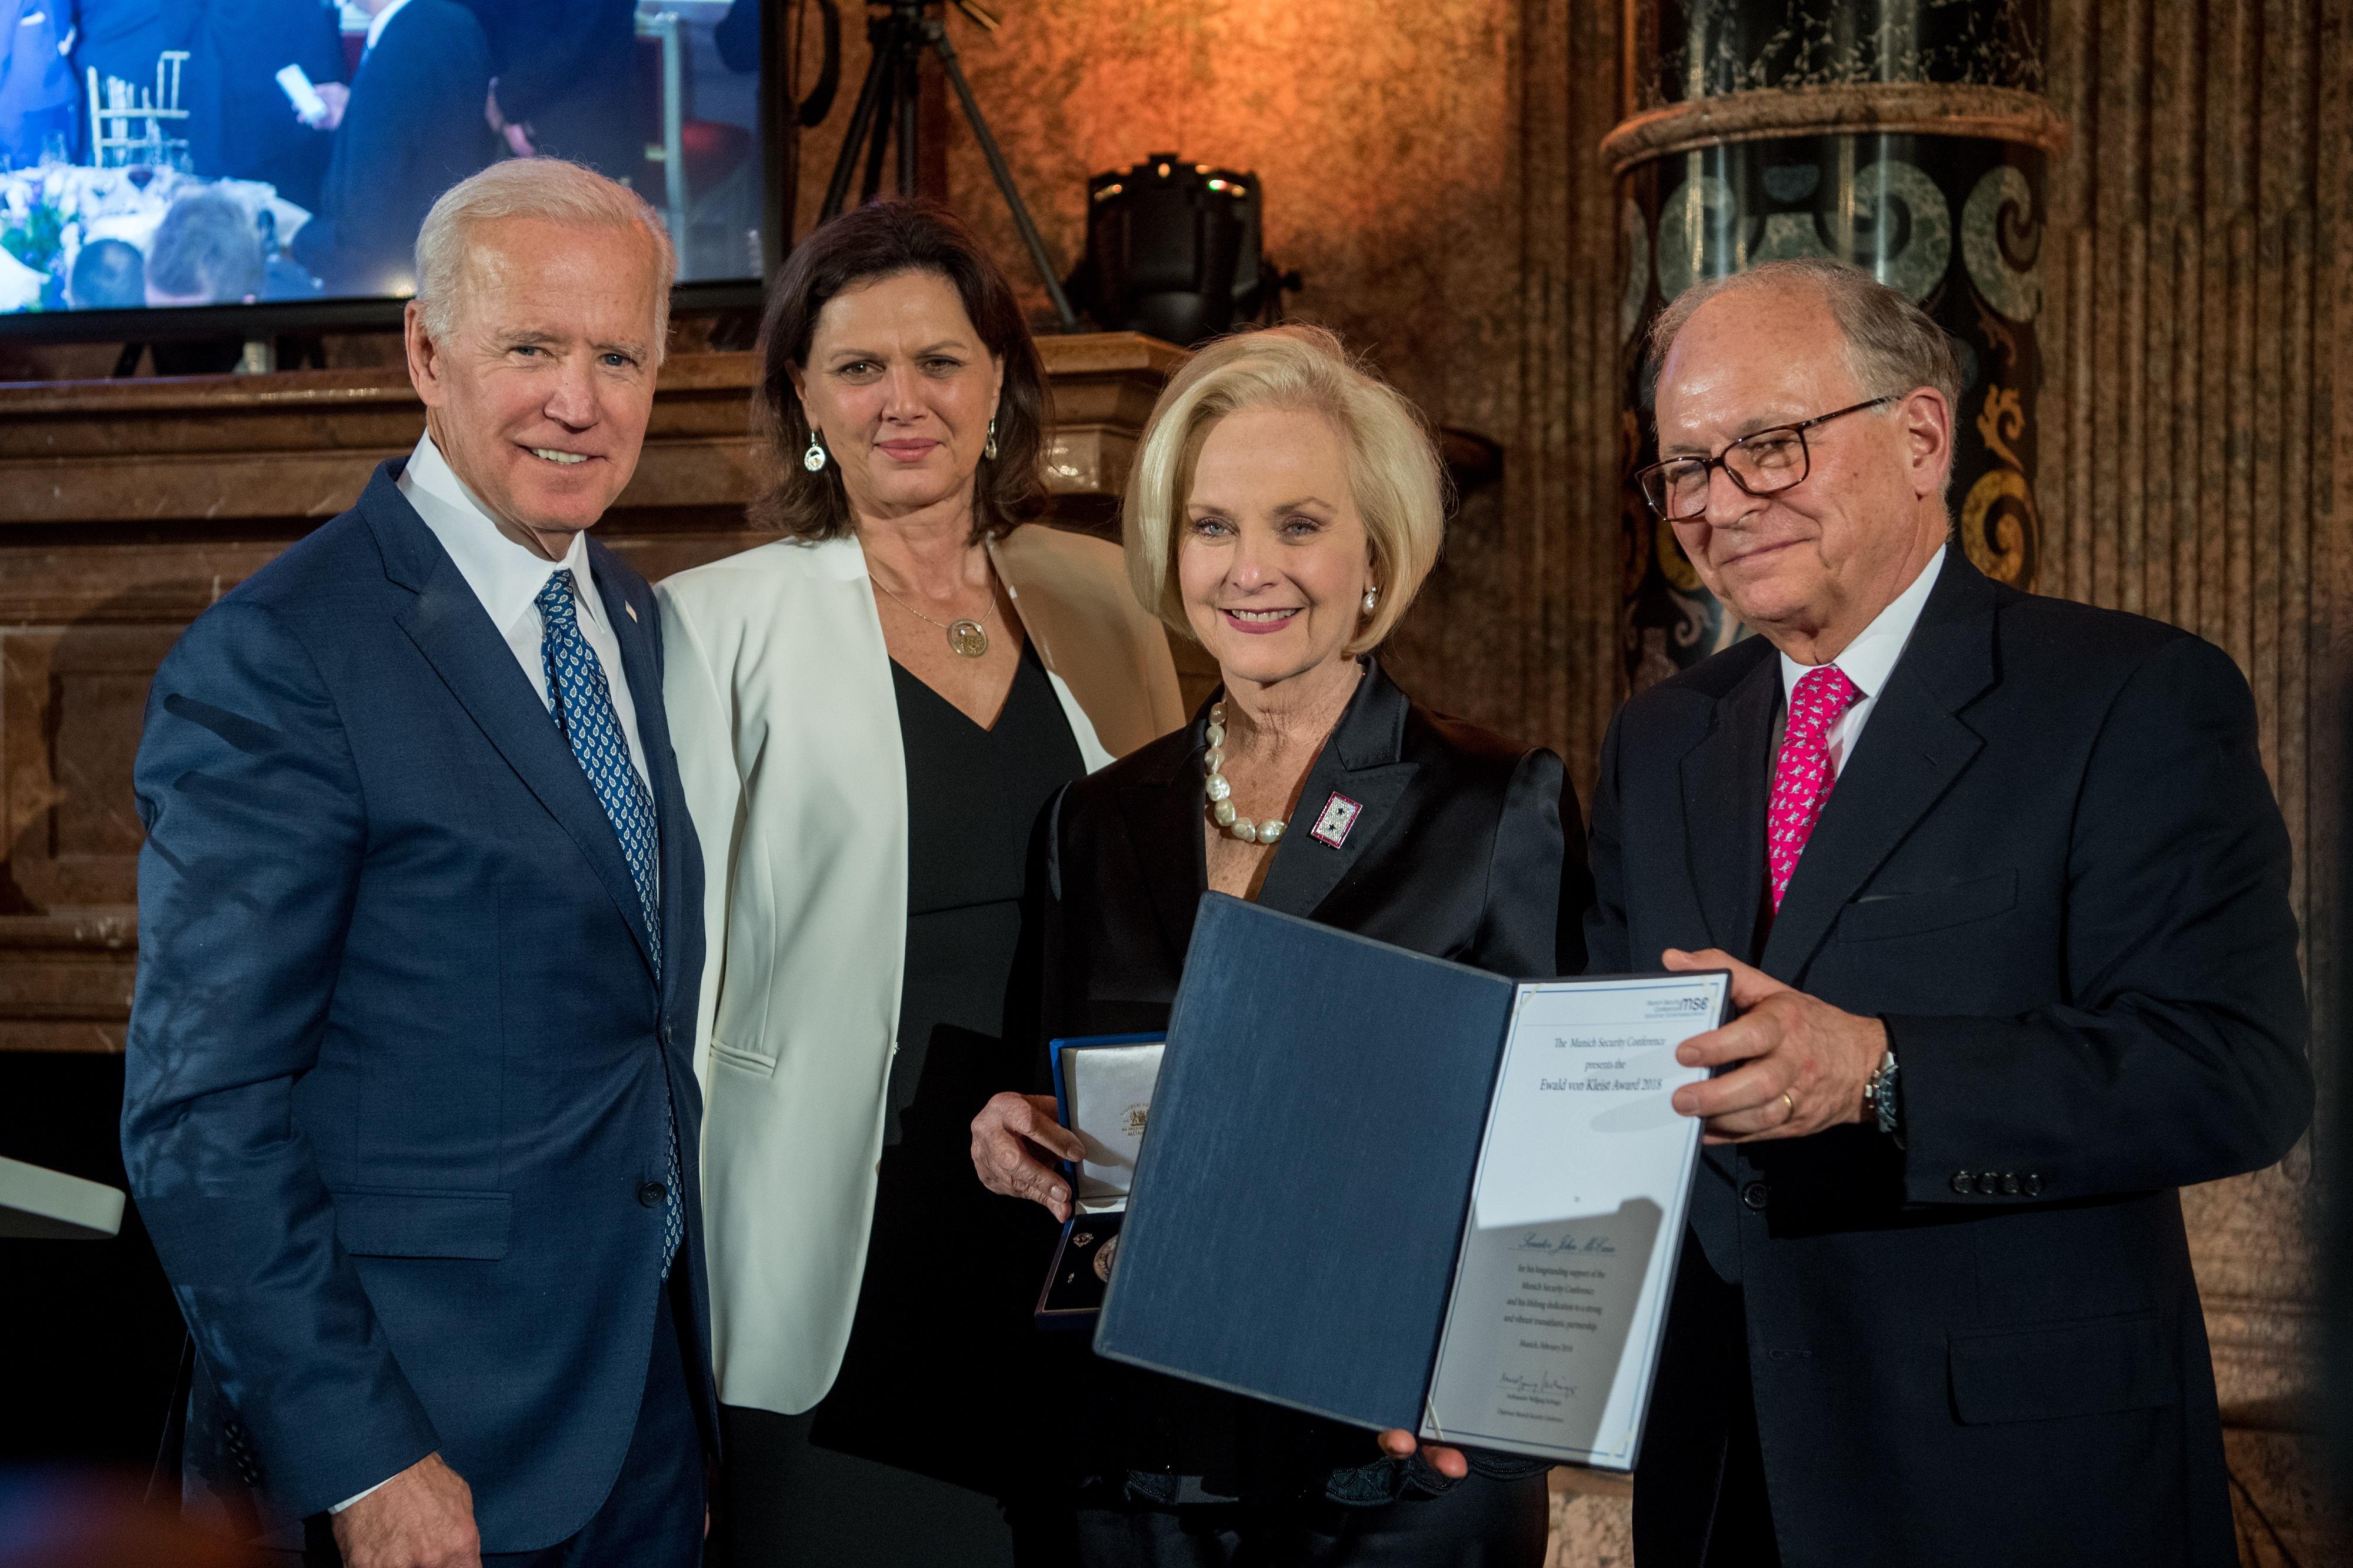 Datei Joseph R Biden Jr Ilse Aigner Cindy McCain Und Wolfgang